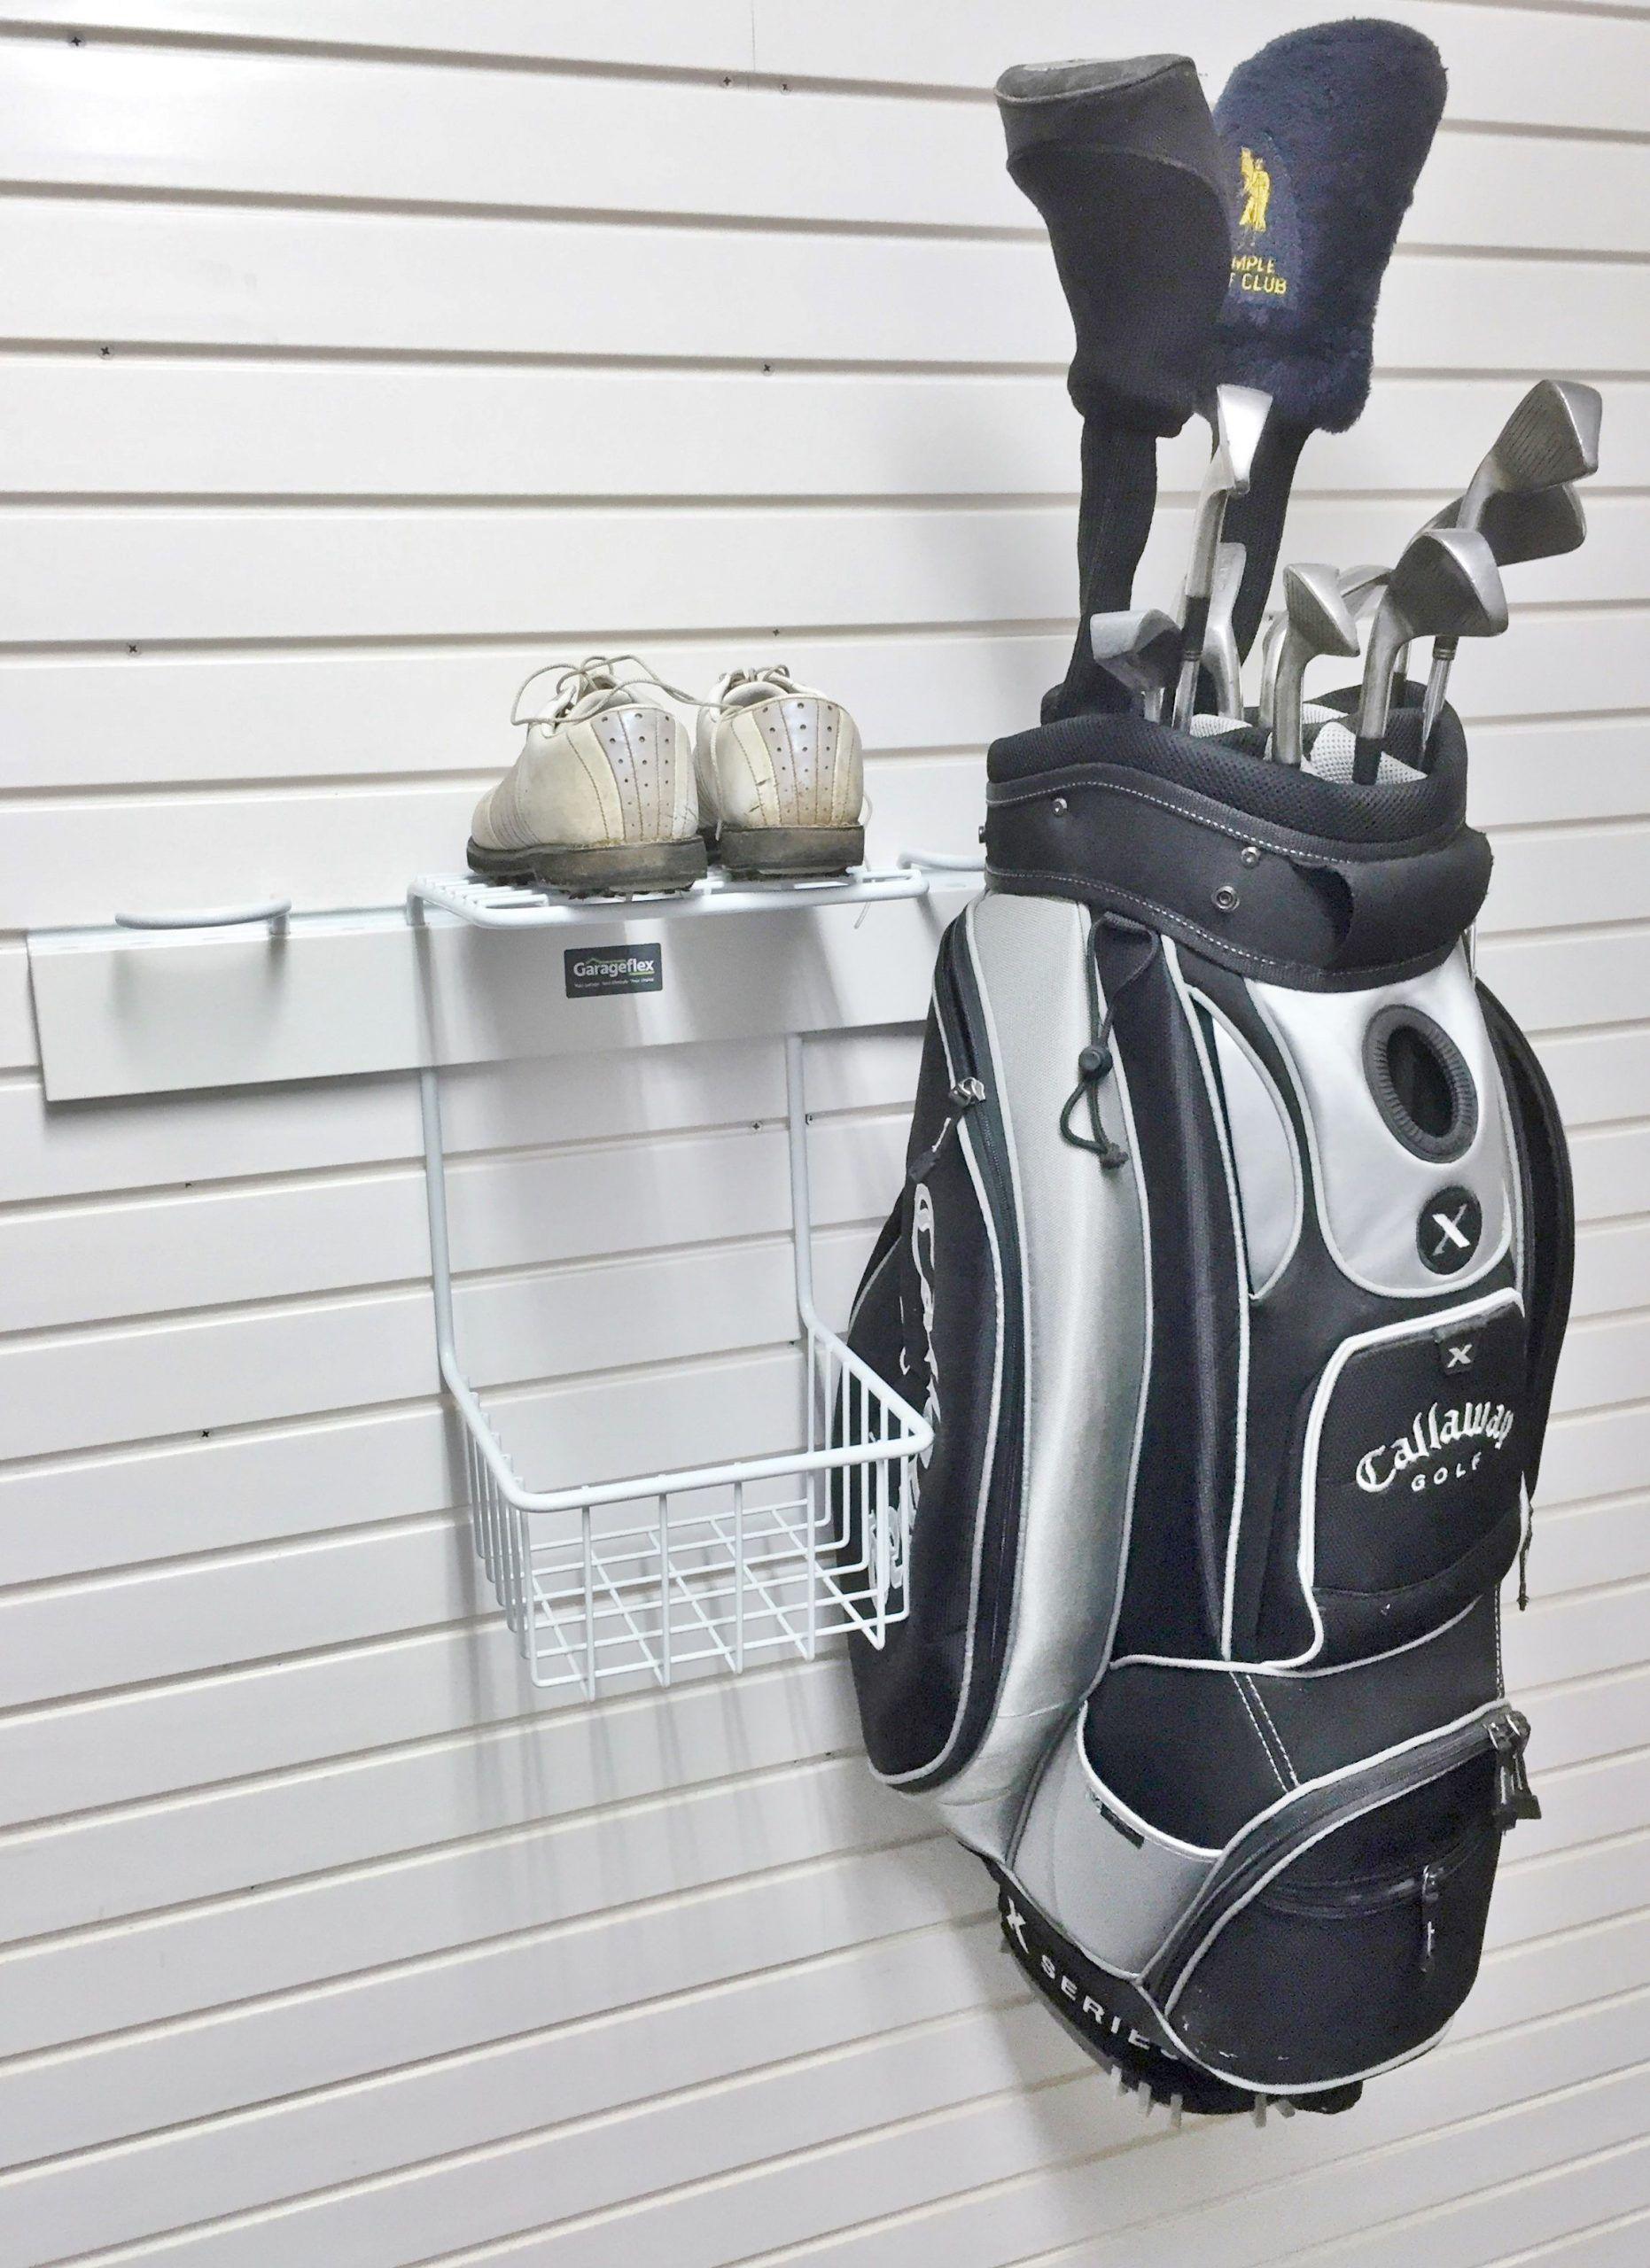 FX2004 Double Golf Rack in 2020 Garage organization diy